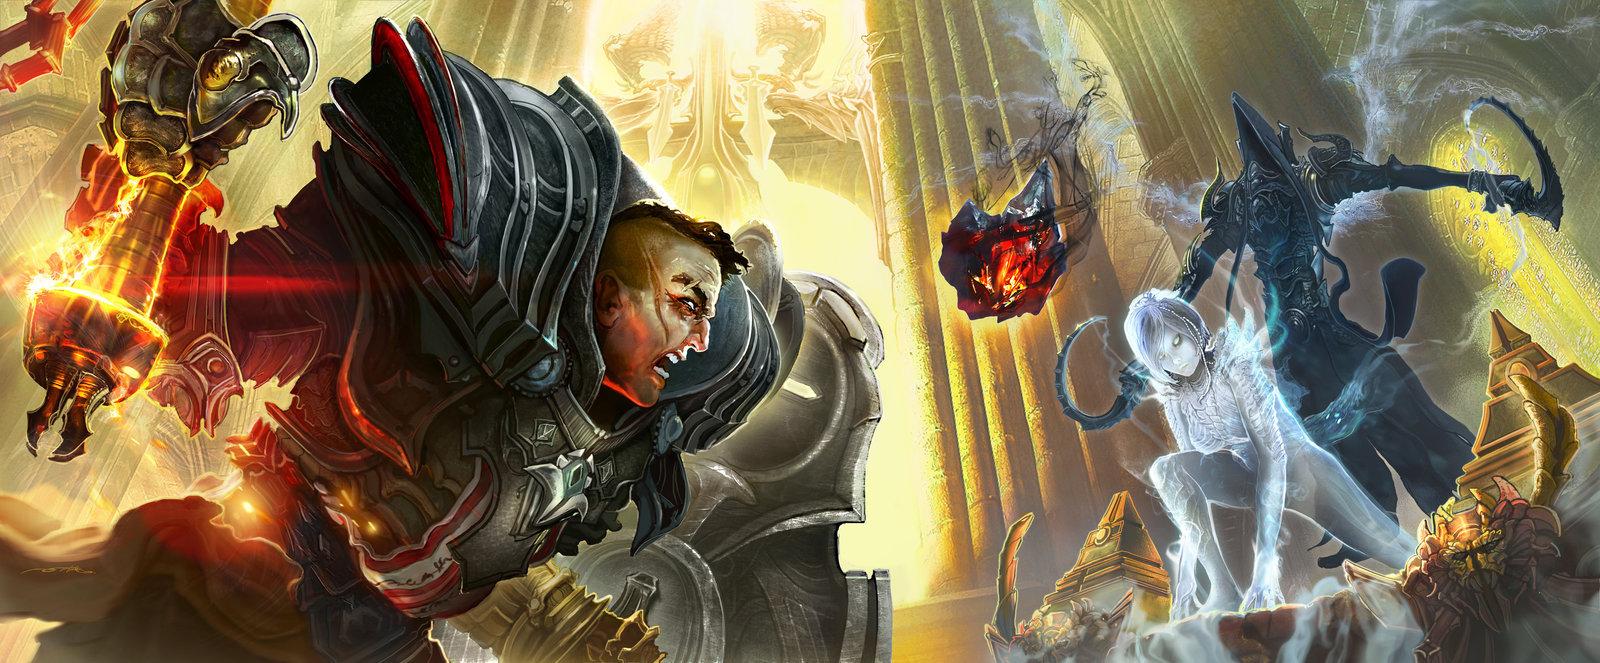 Diablo 3 reaper of souls fan art   death awaits by ertacaltinoz d7a3rqd